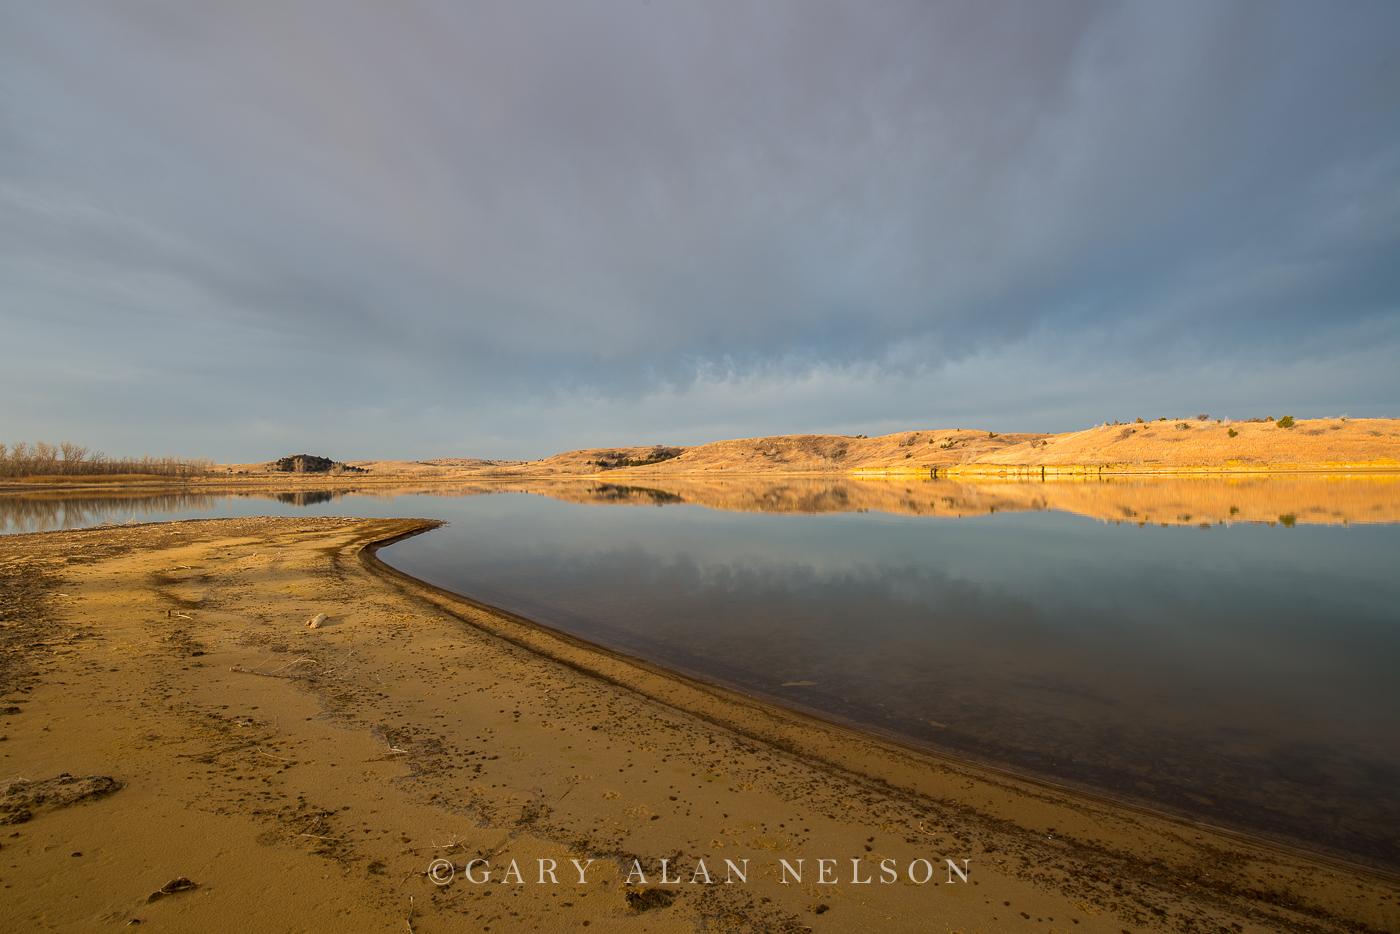 storm clouds, wilson lake, kansas, state park, photo